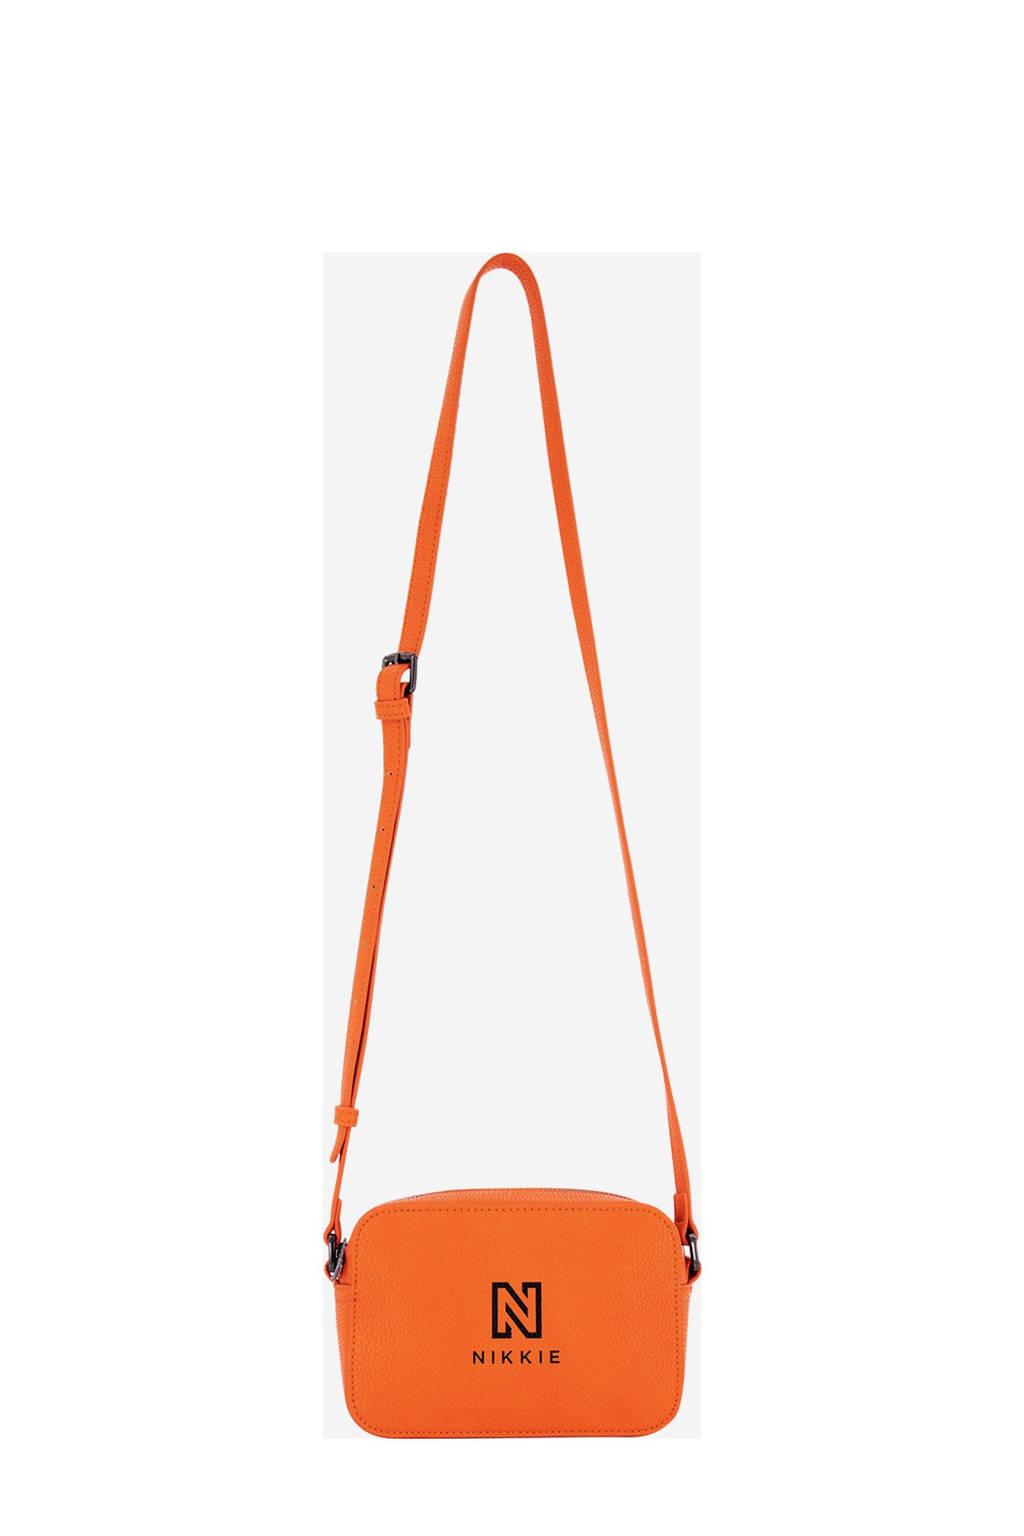 NIKKIE   crossbody tas oranje, Oranje